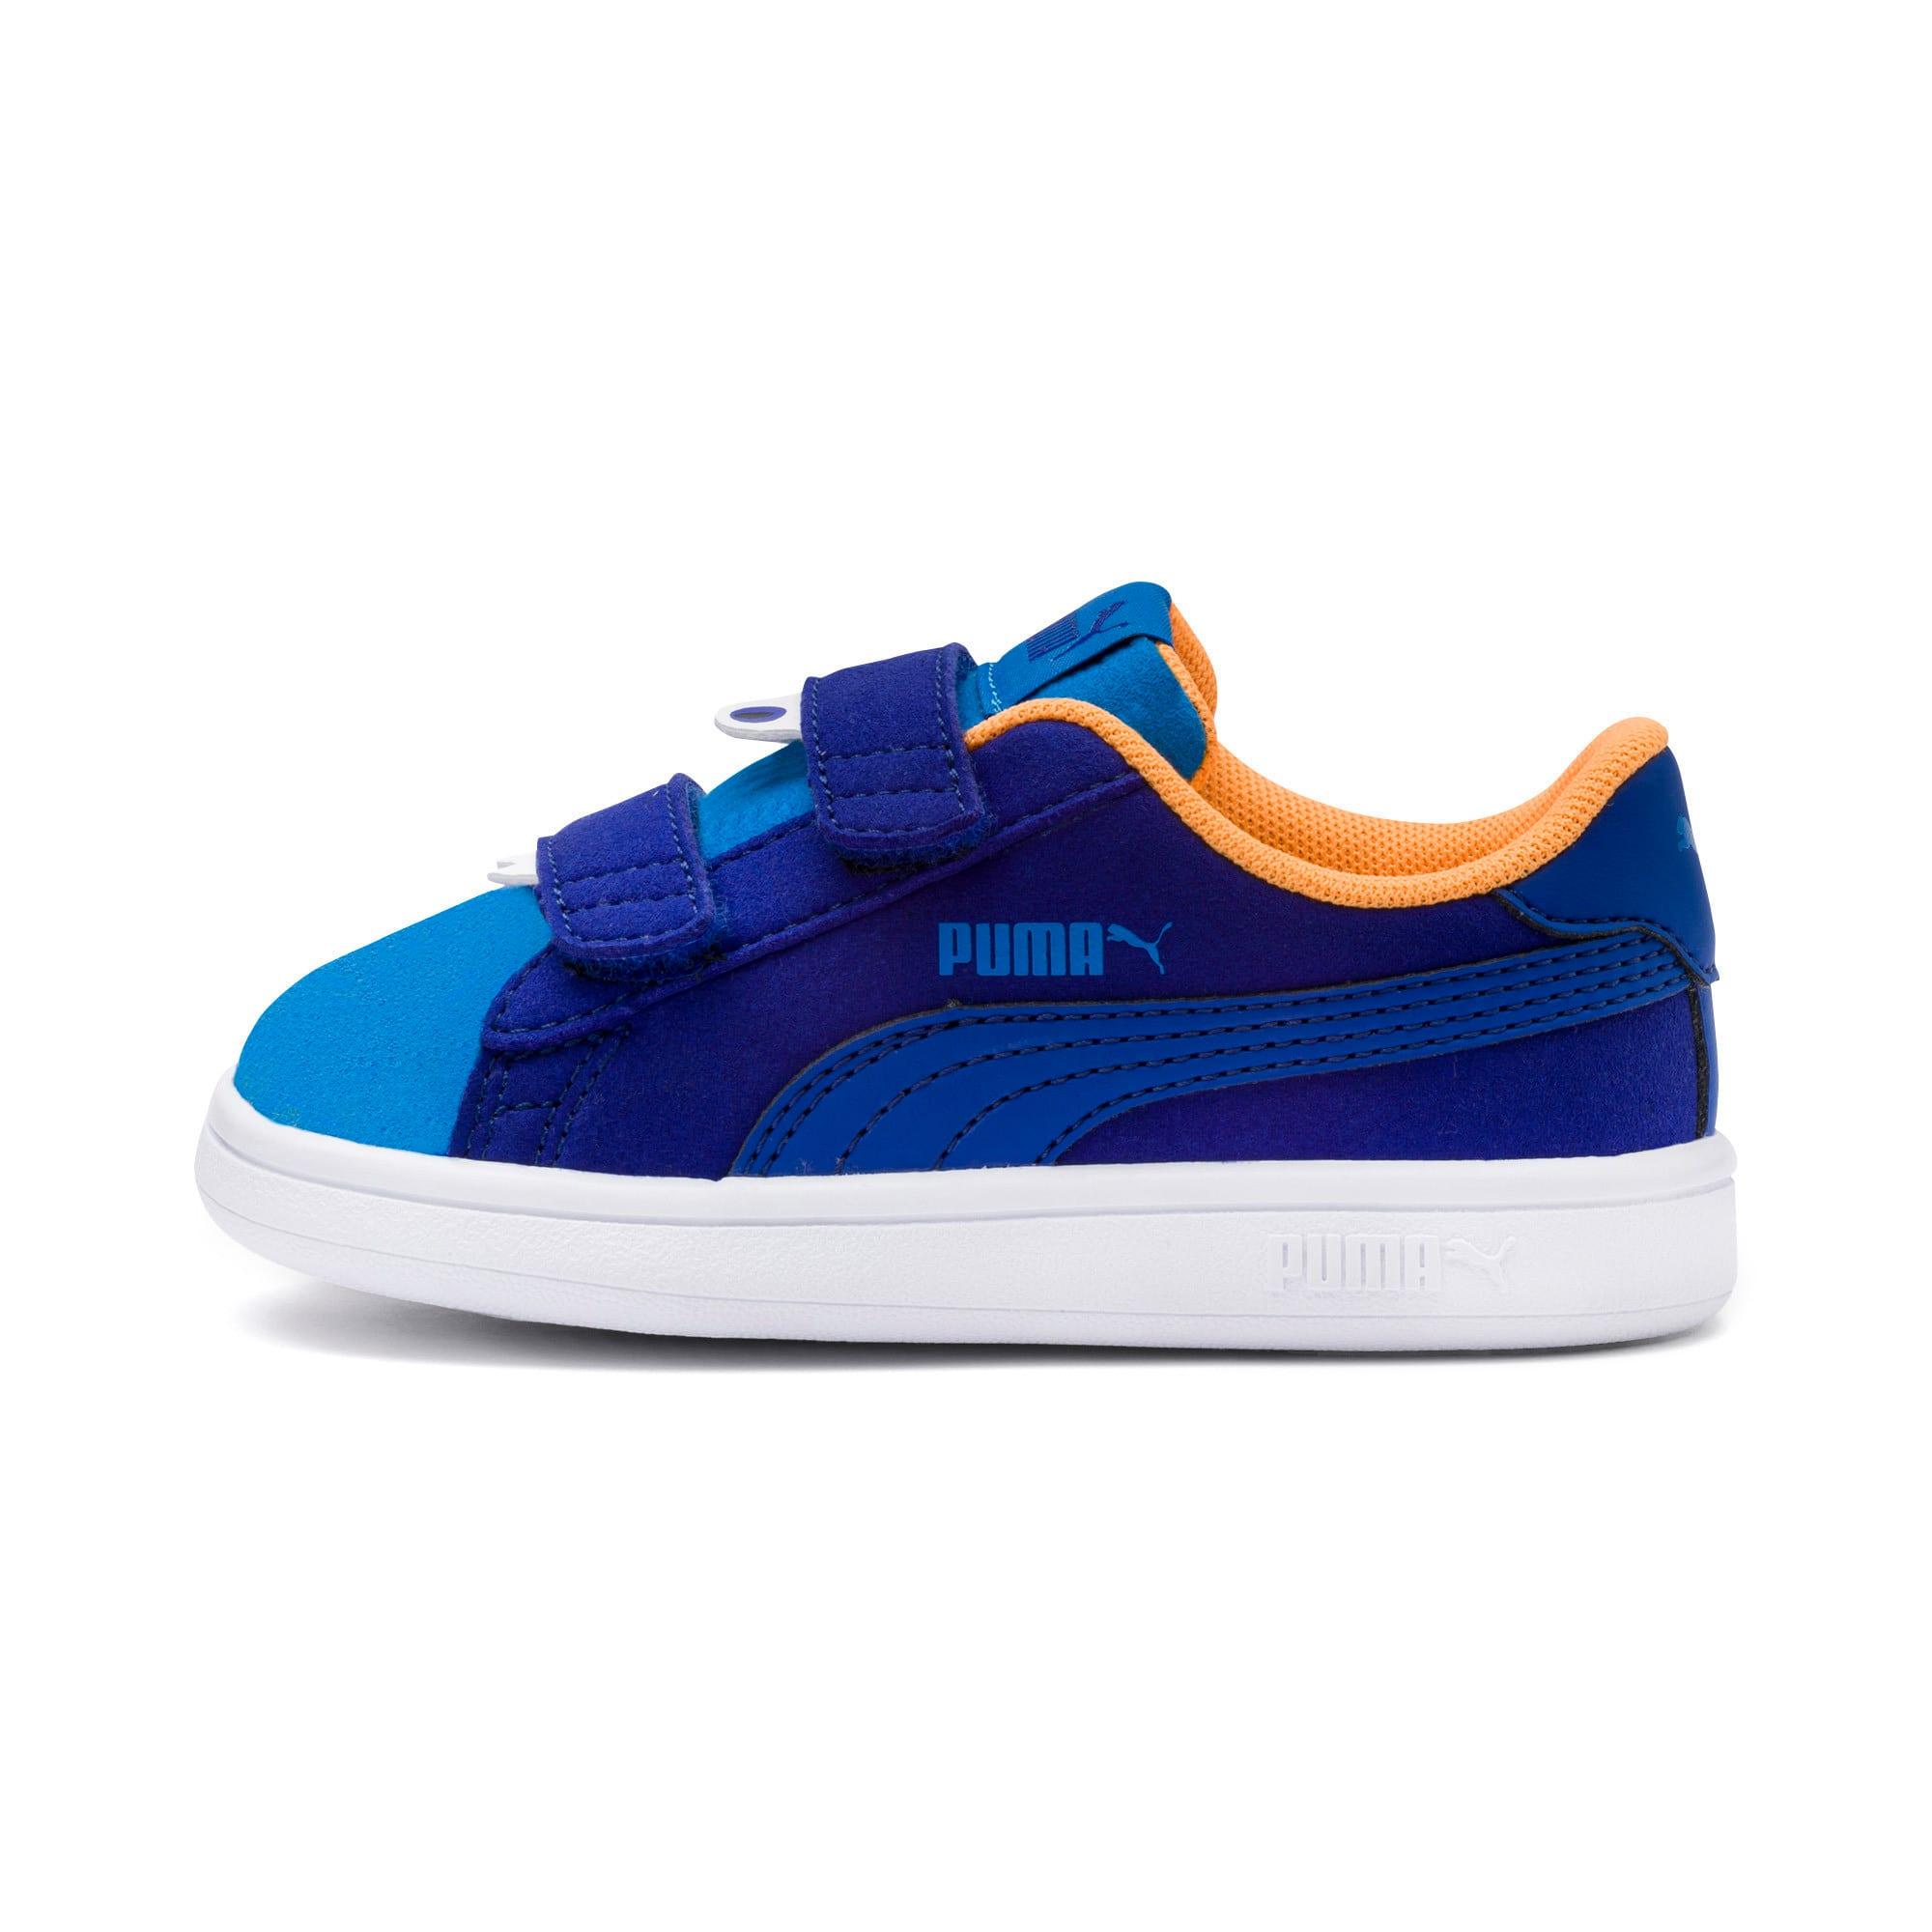 Thumbnail 1 of PUMA Smash v2 Monster Toddler Shoes, Sf Th Wb-I Bunting-Ornge-Wht, medium